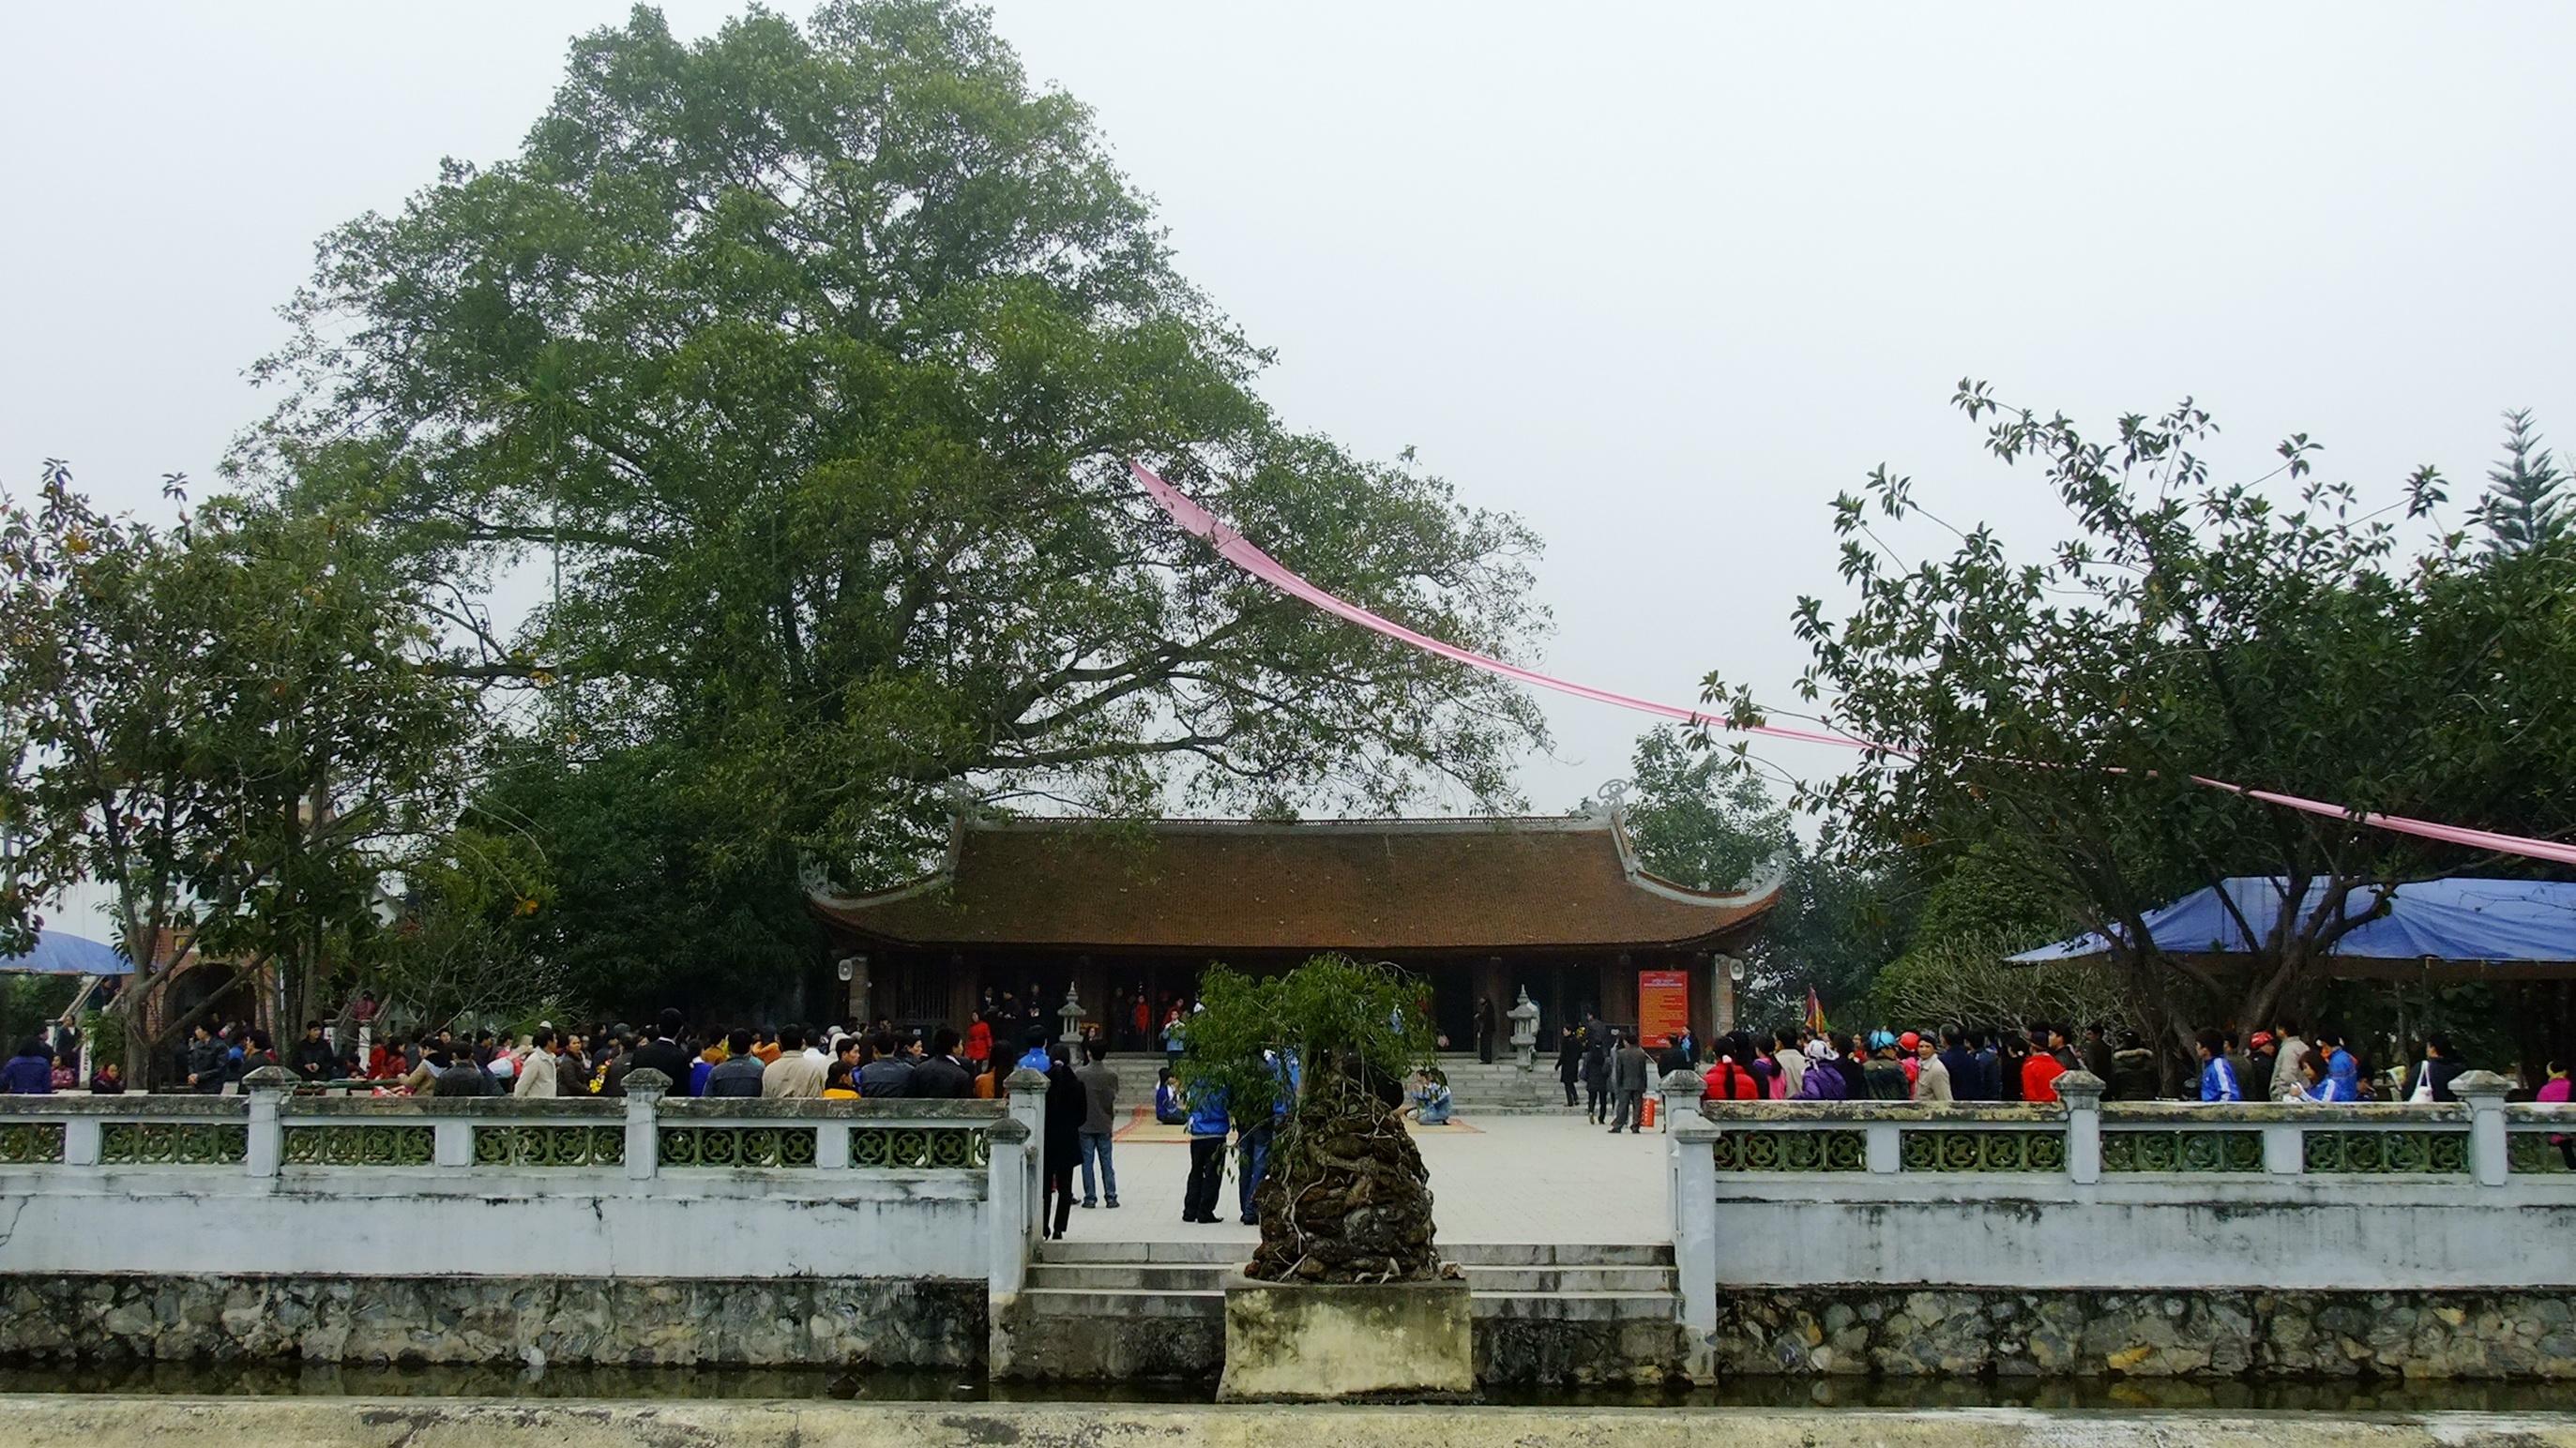 du lịch Phú Thọ 10